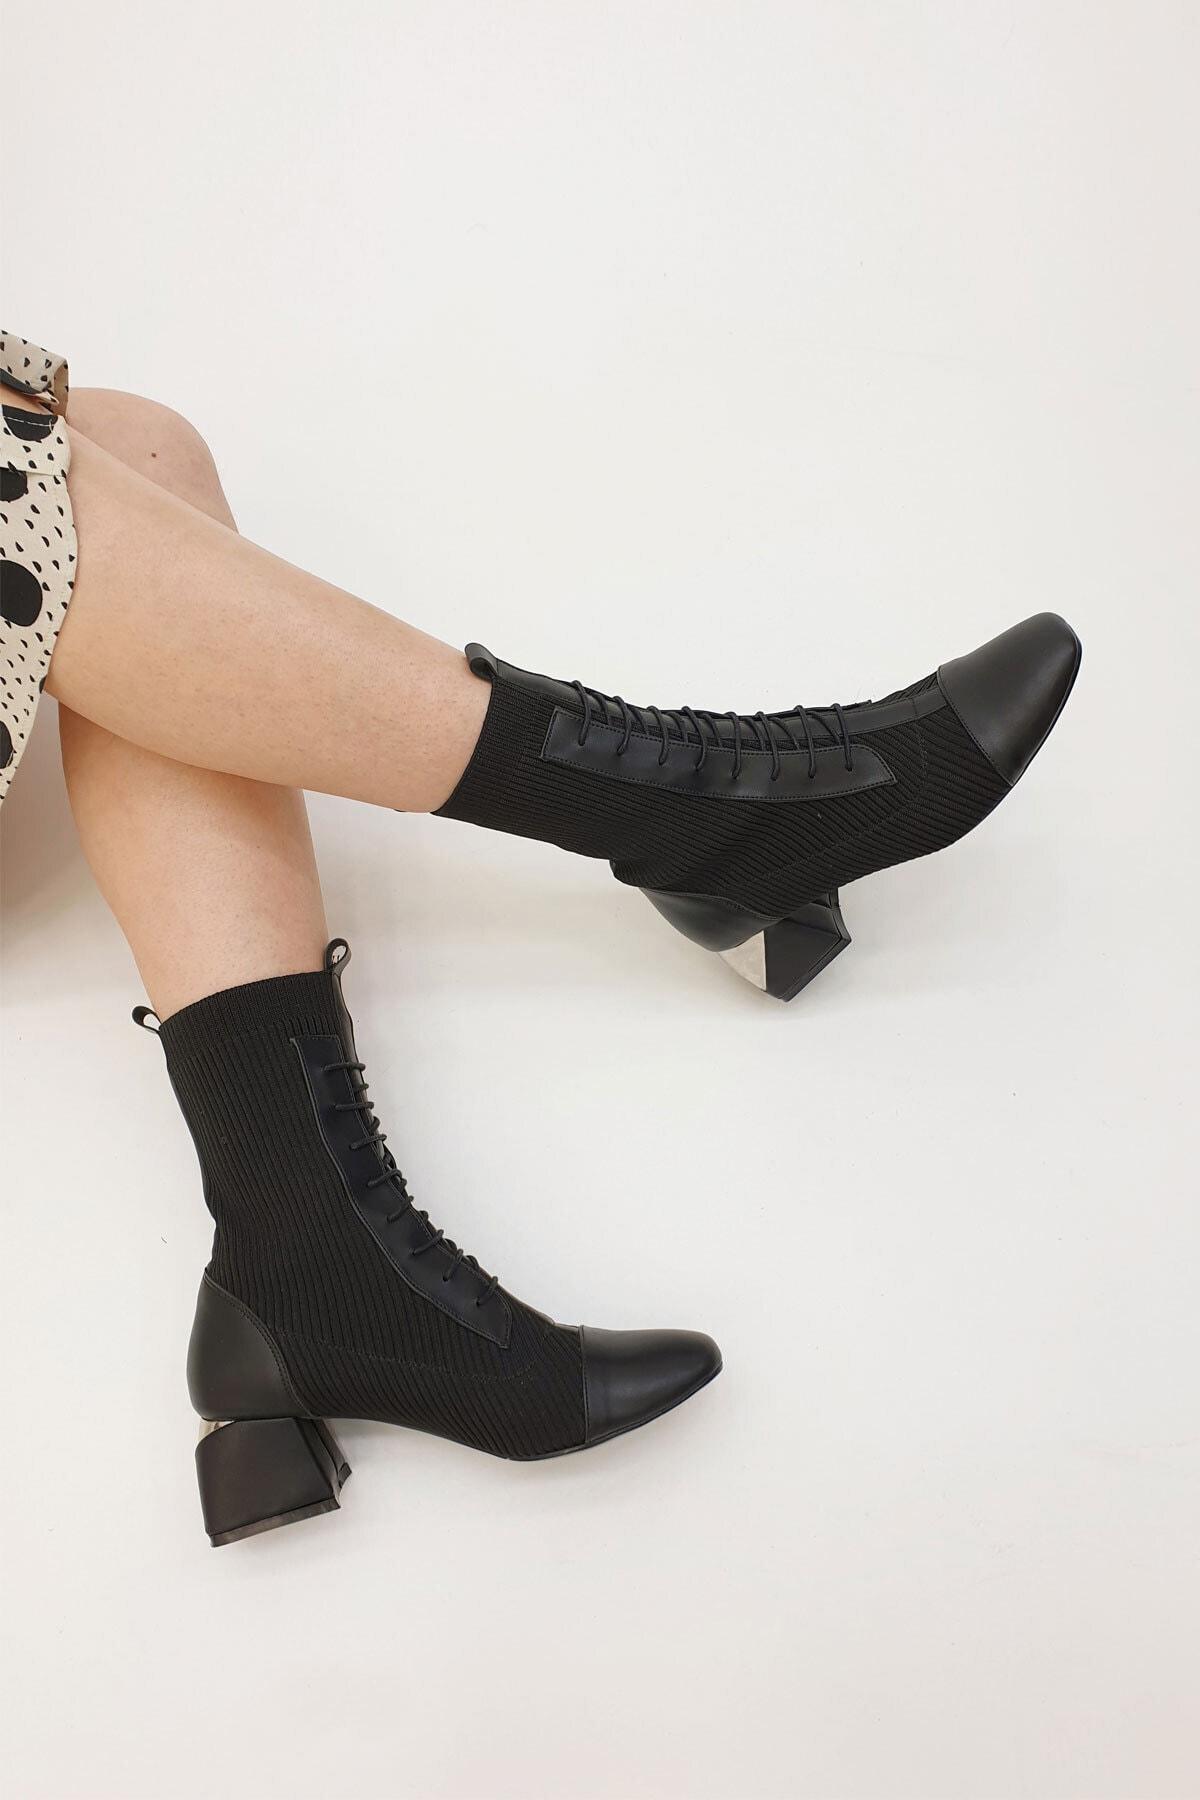 Marjin Larin Kadın Çorap Topuklu Botsiyah 1